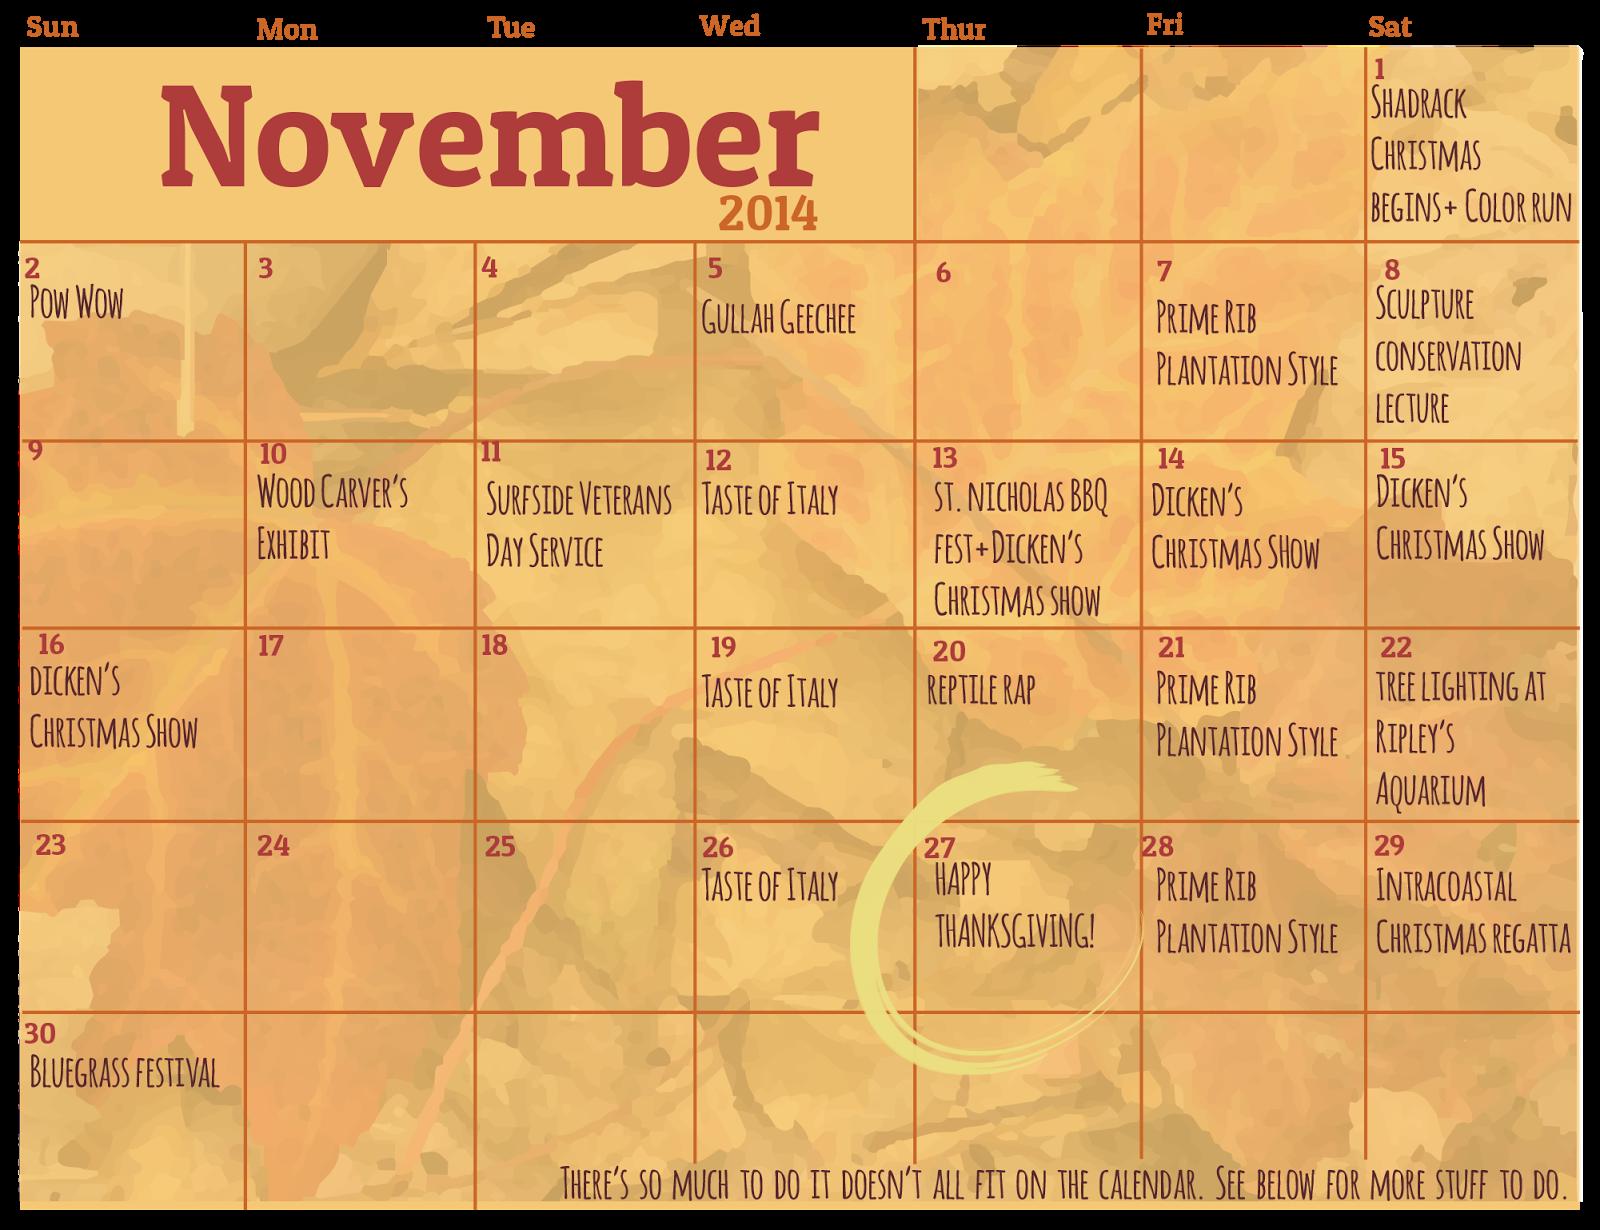 Myrtle Beach Events Friday November